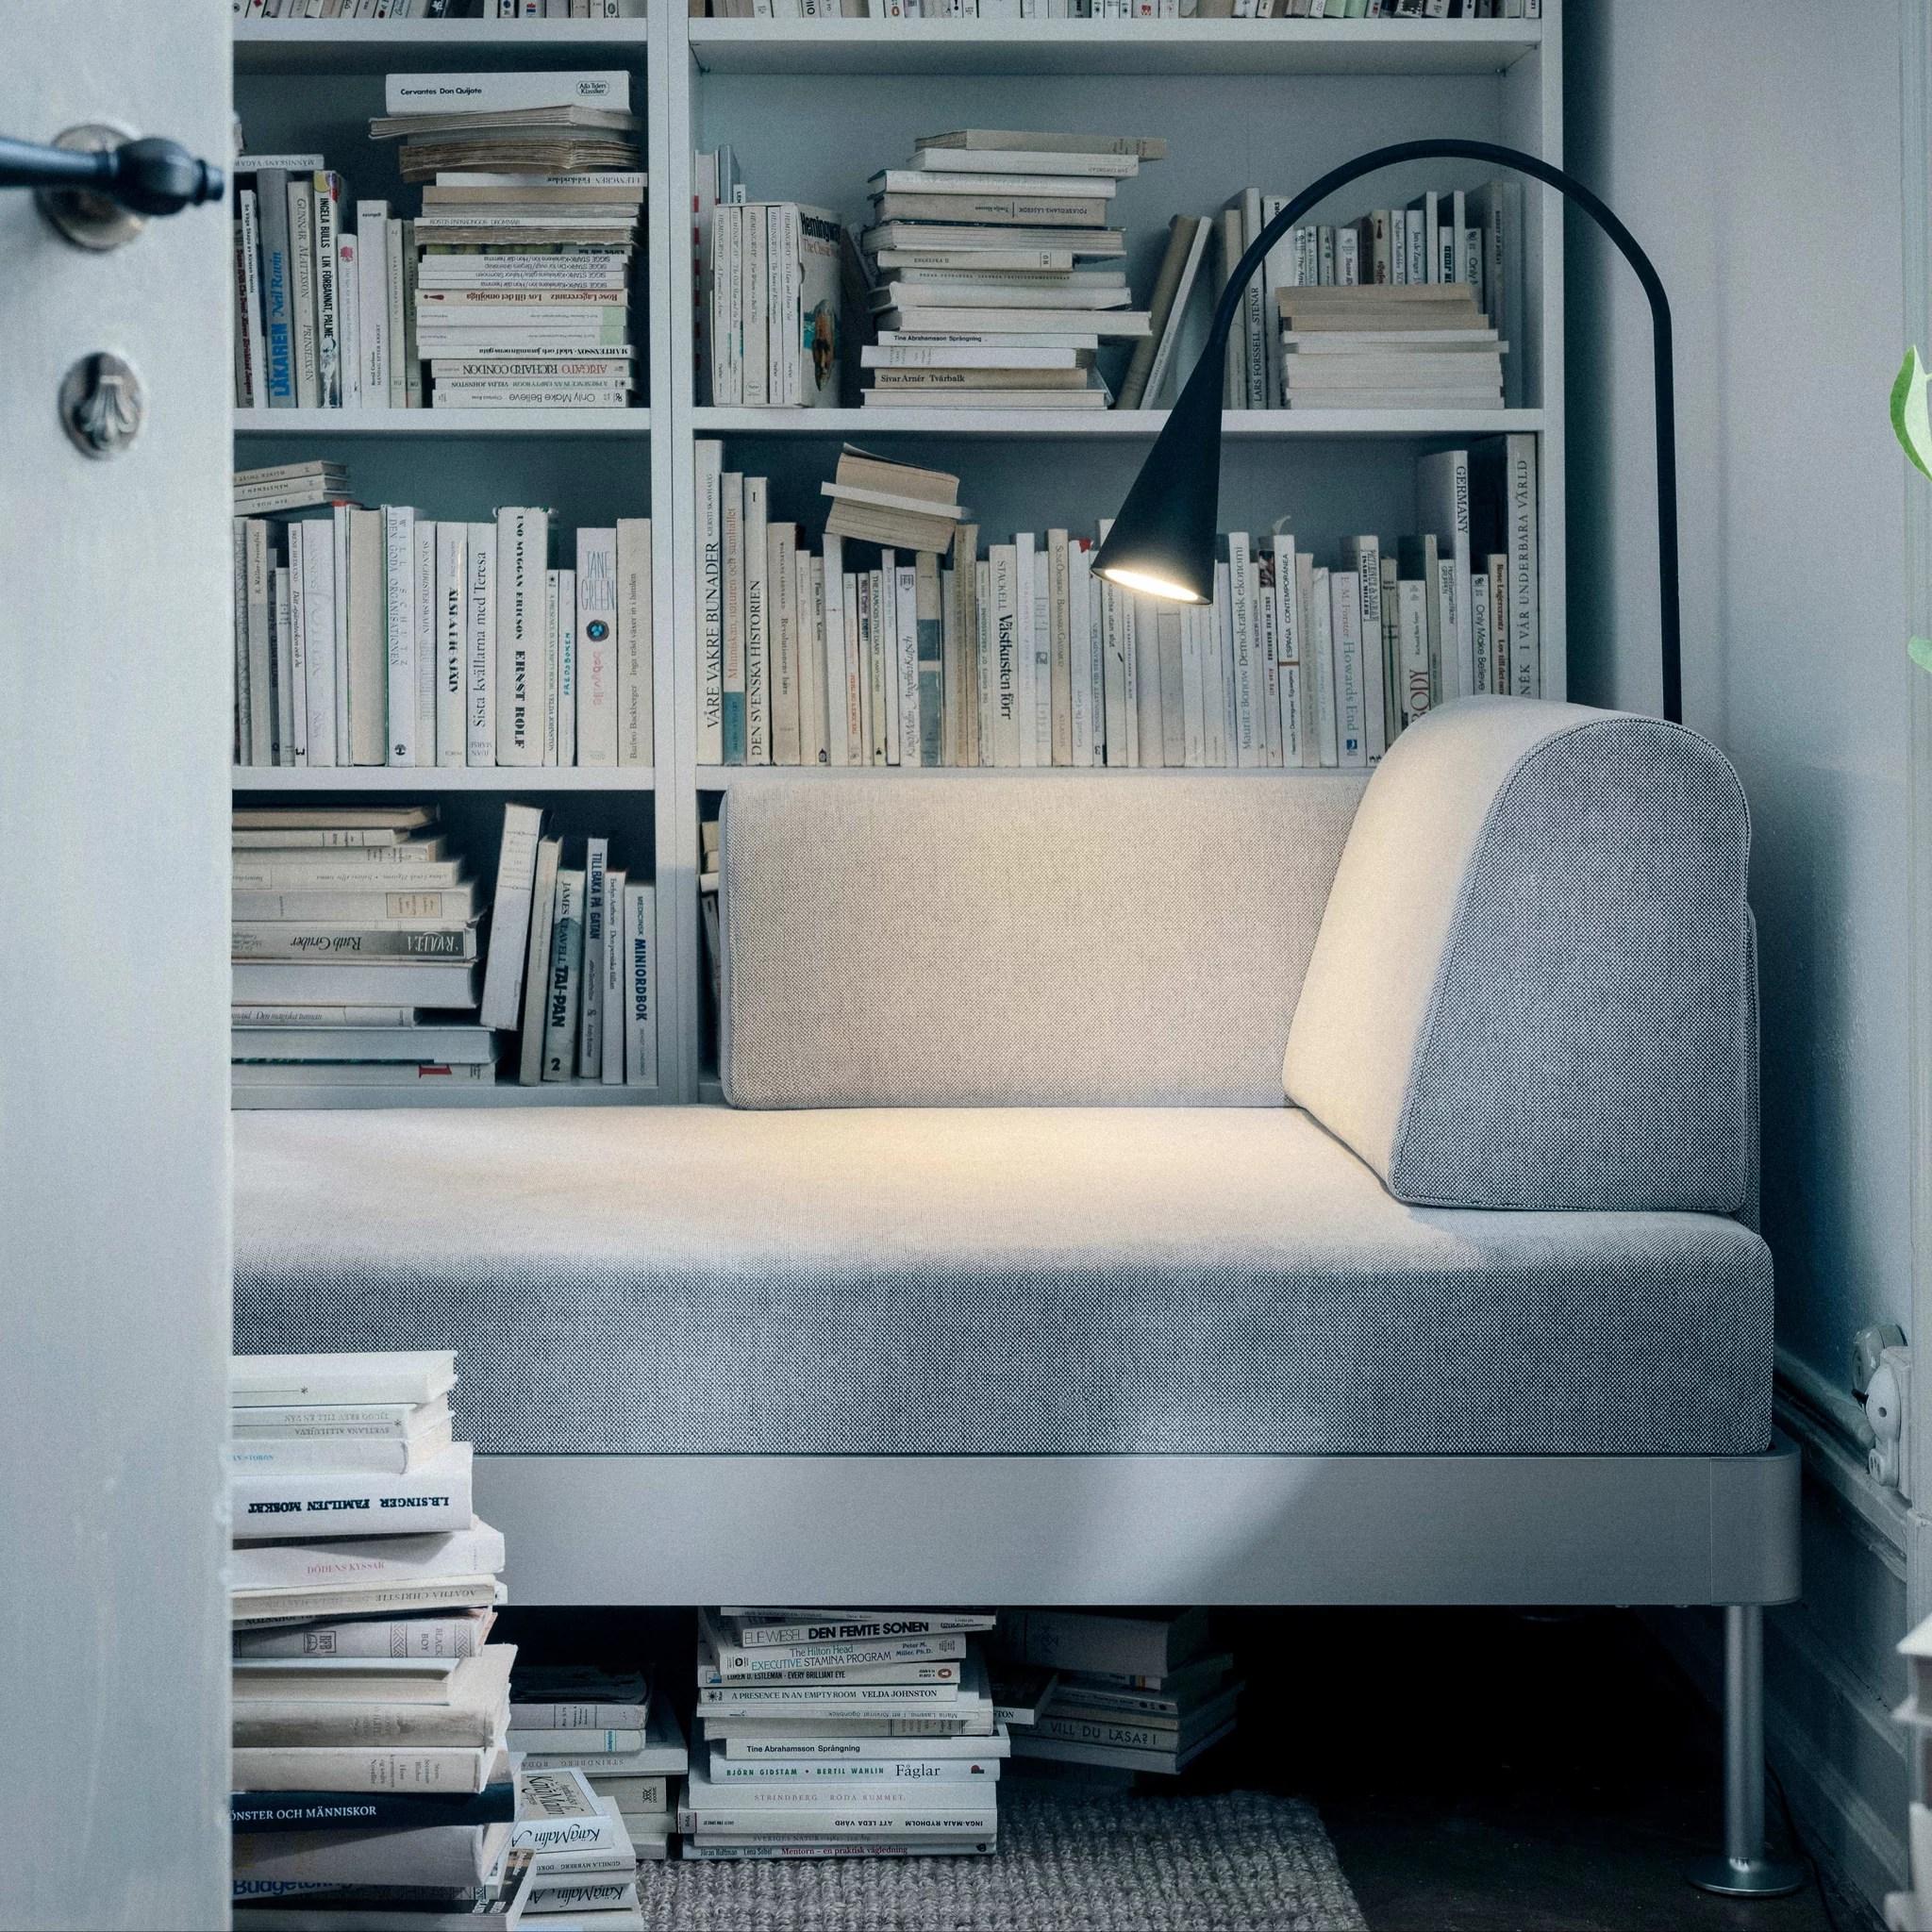 ikea sofa beds australia cheap for bedroom sofs with finest the delaktig a